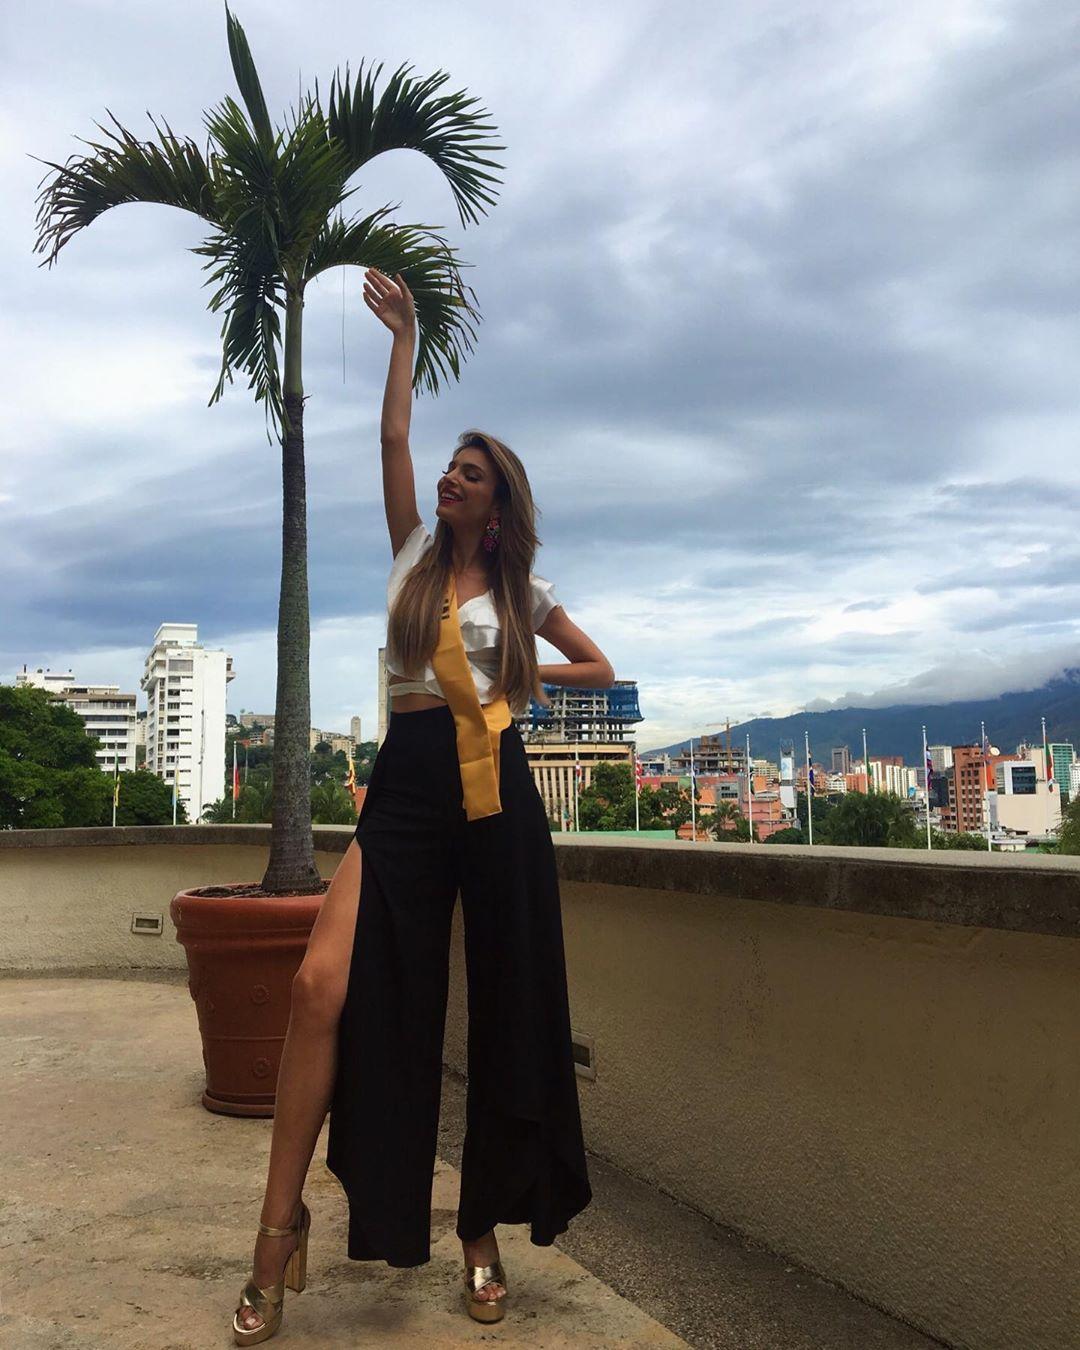 ainara de santamaria villamor, top 21 de miss grand international 2019/miss world cantabria 2018/miss earth spain 2017. - Página 14 70630010